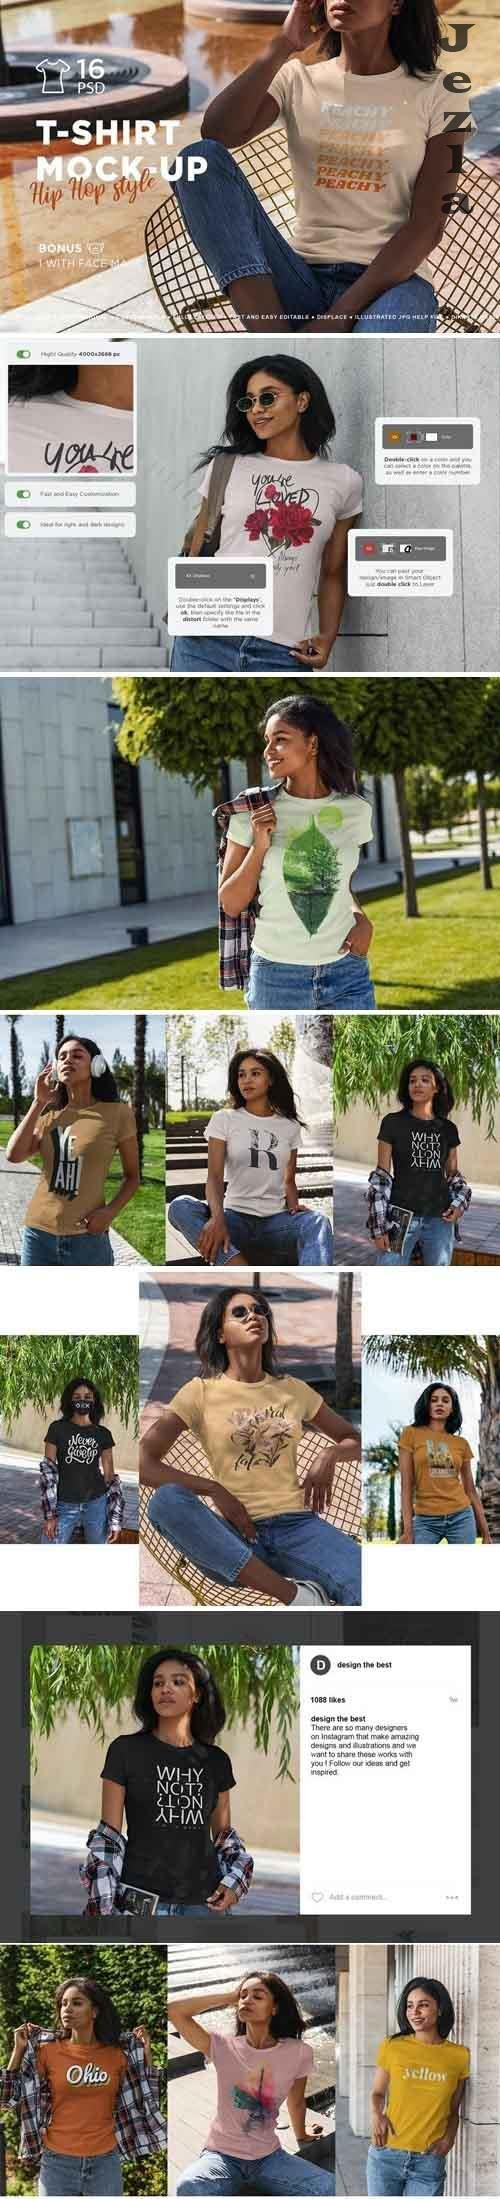 T-Shirt Mock-Up Hip Hop Style - 5066281